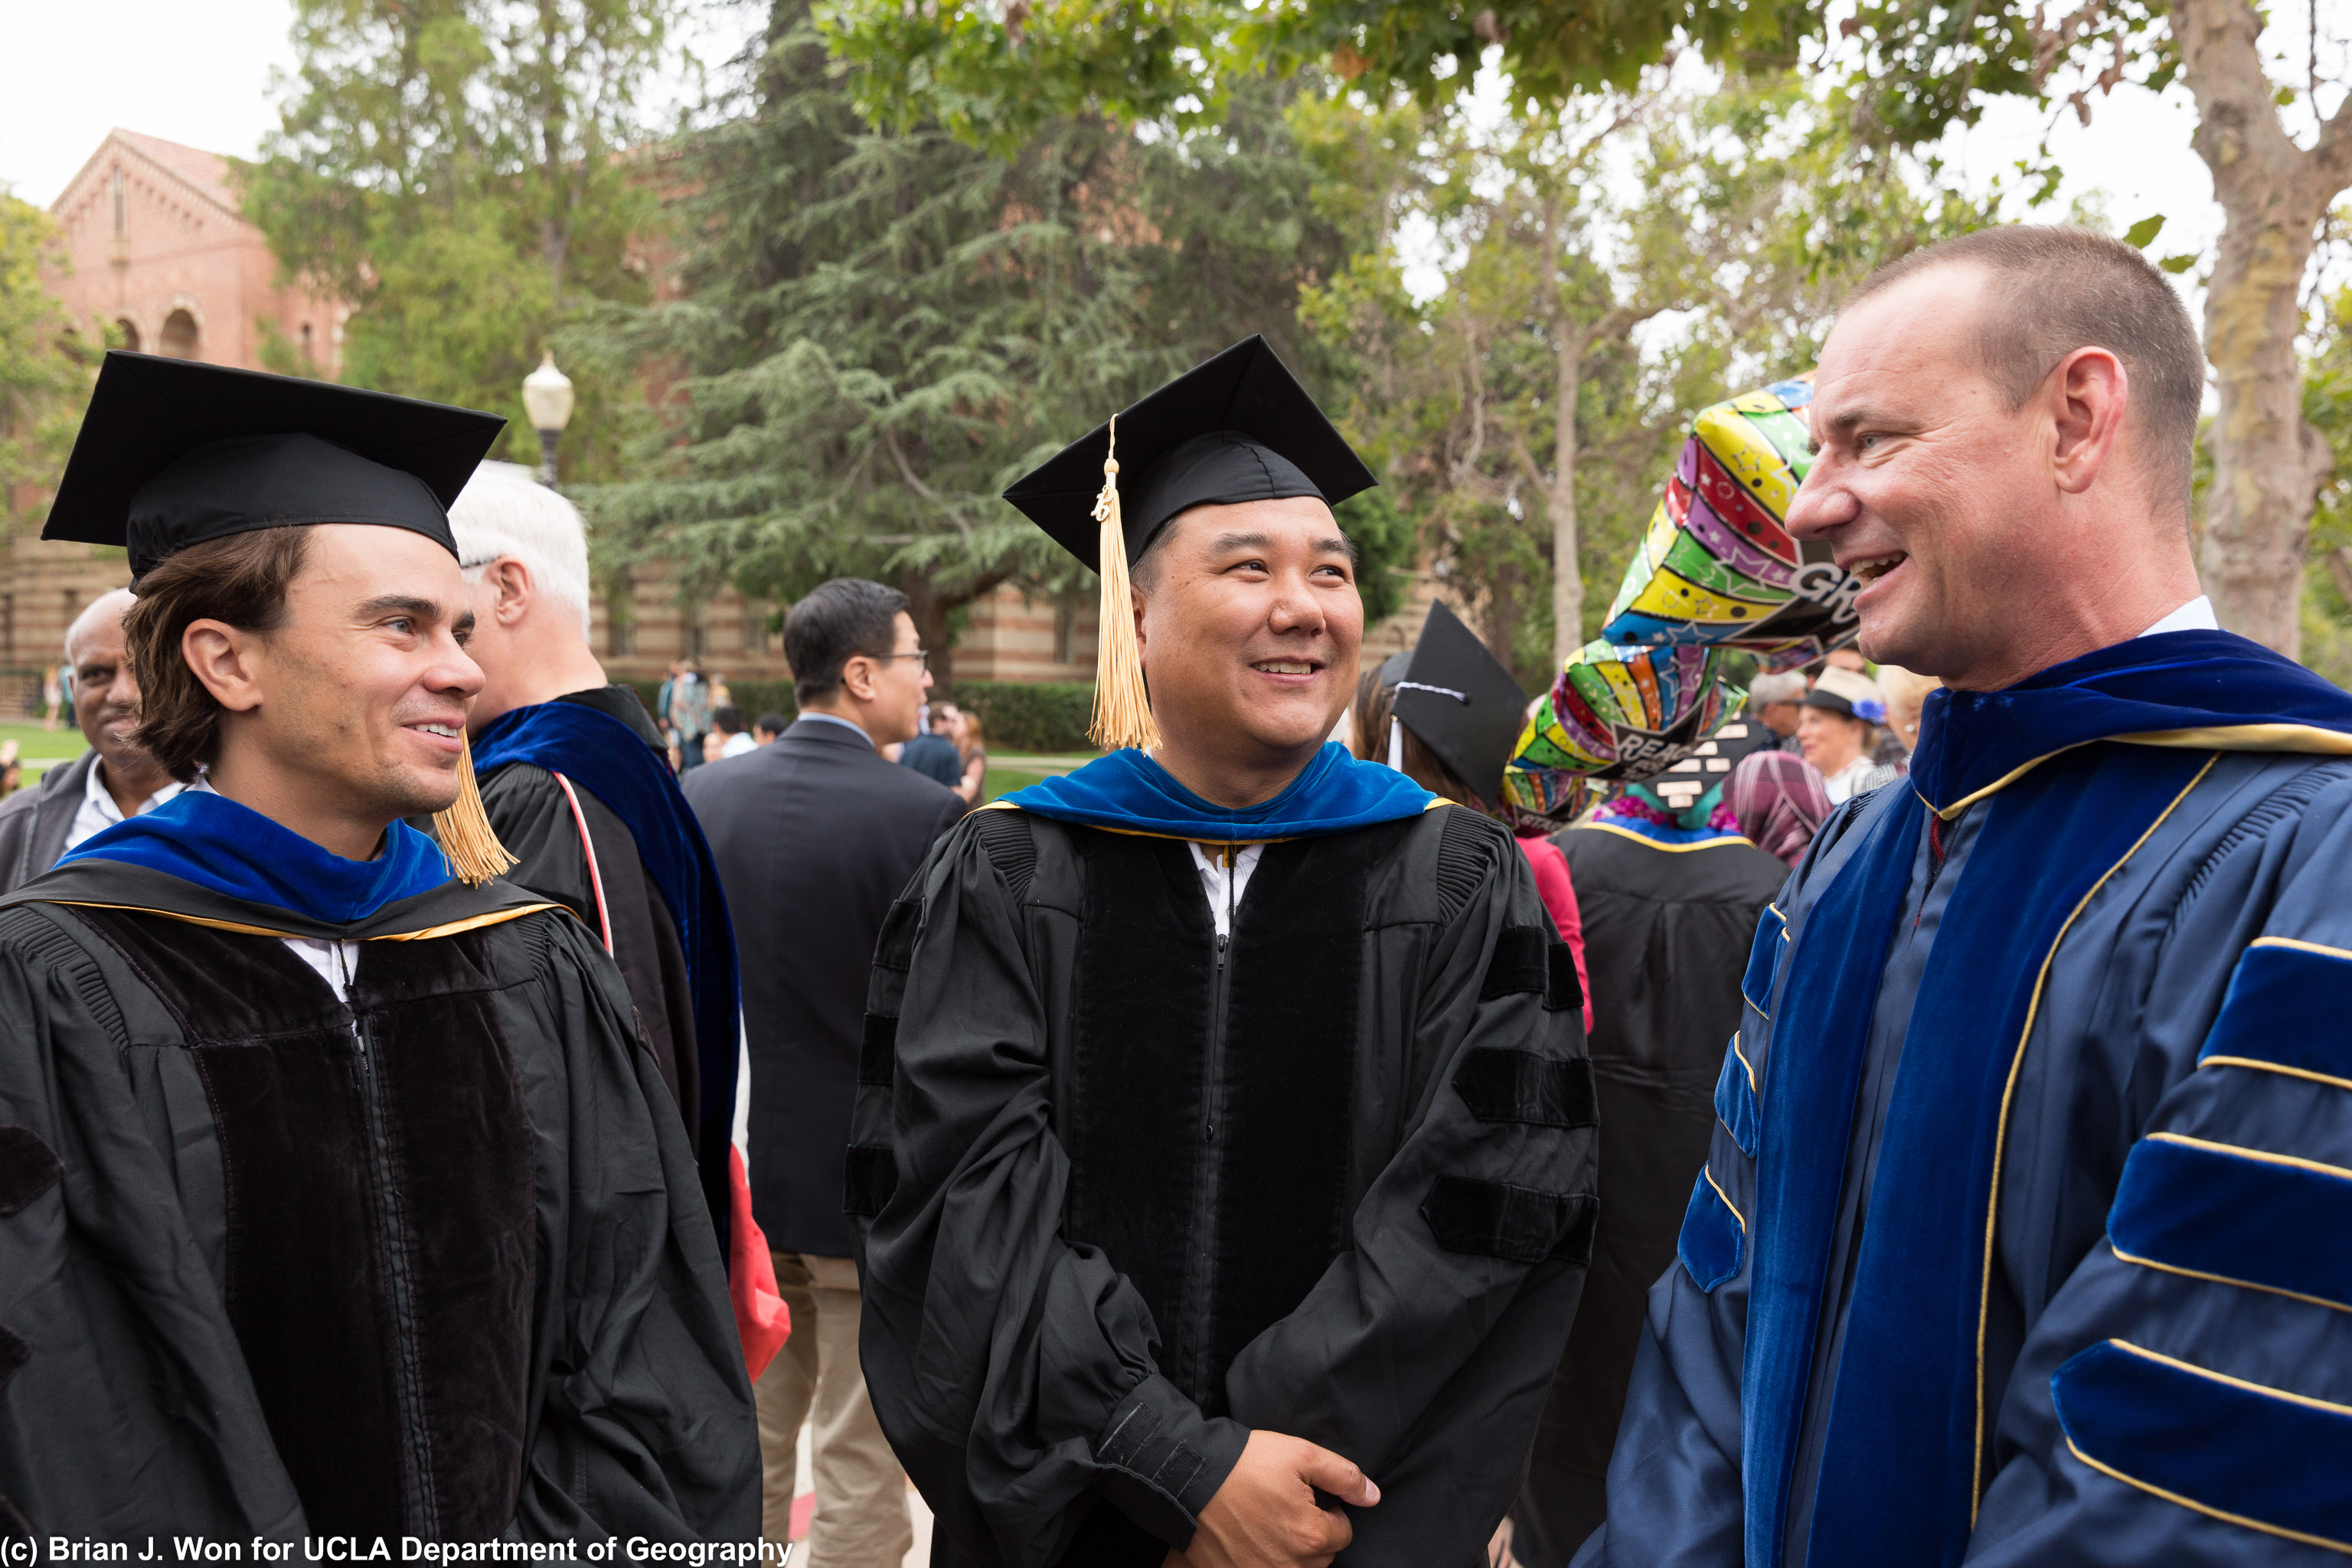 Professors Cavanaugh, Shin, and Gillespie